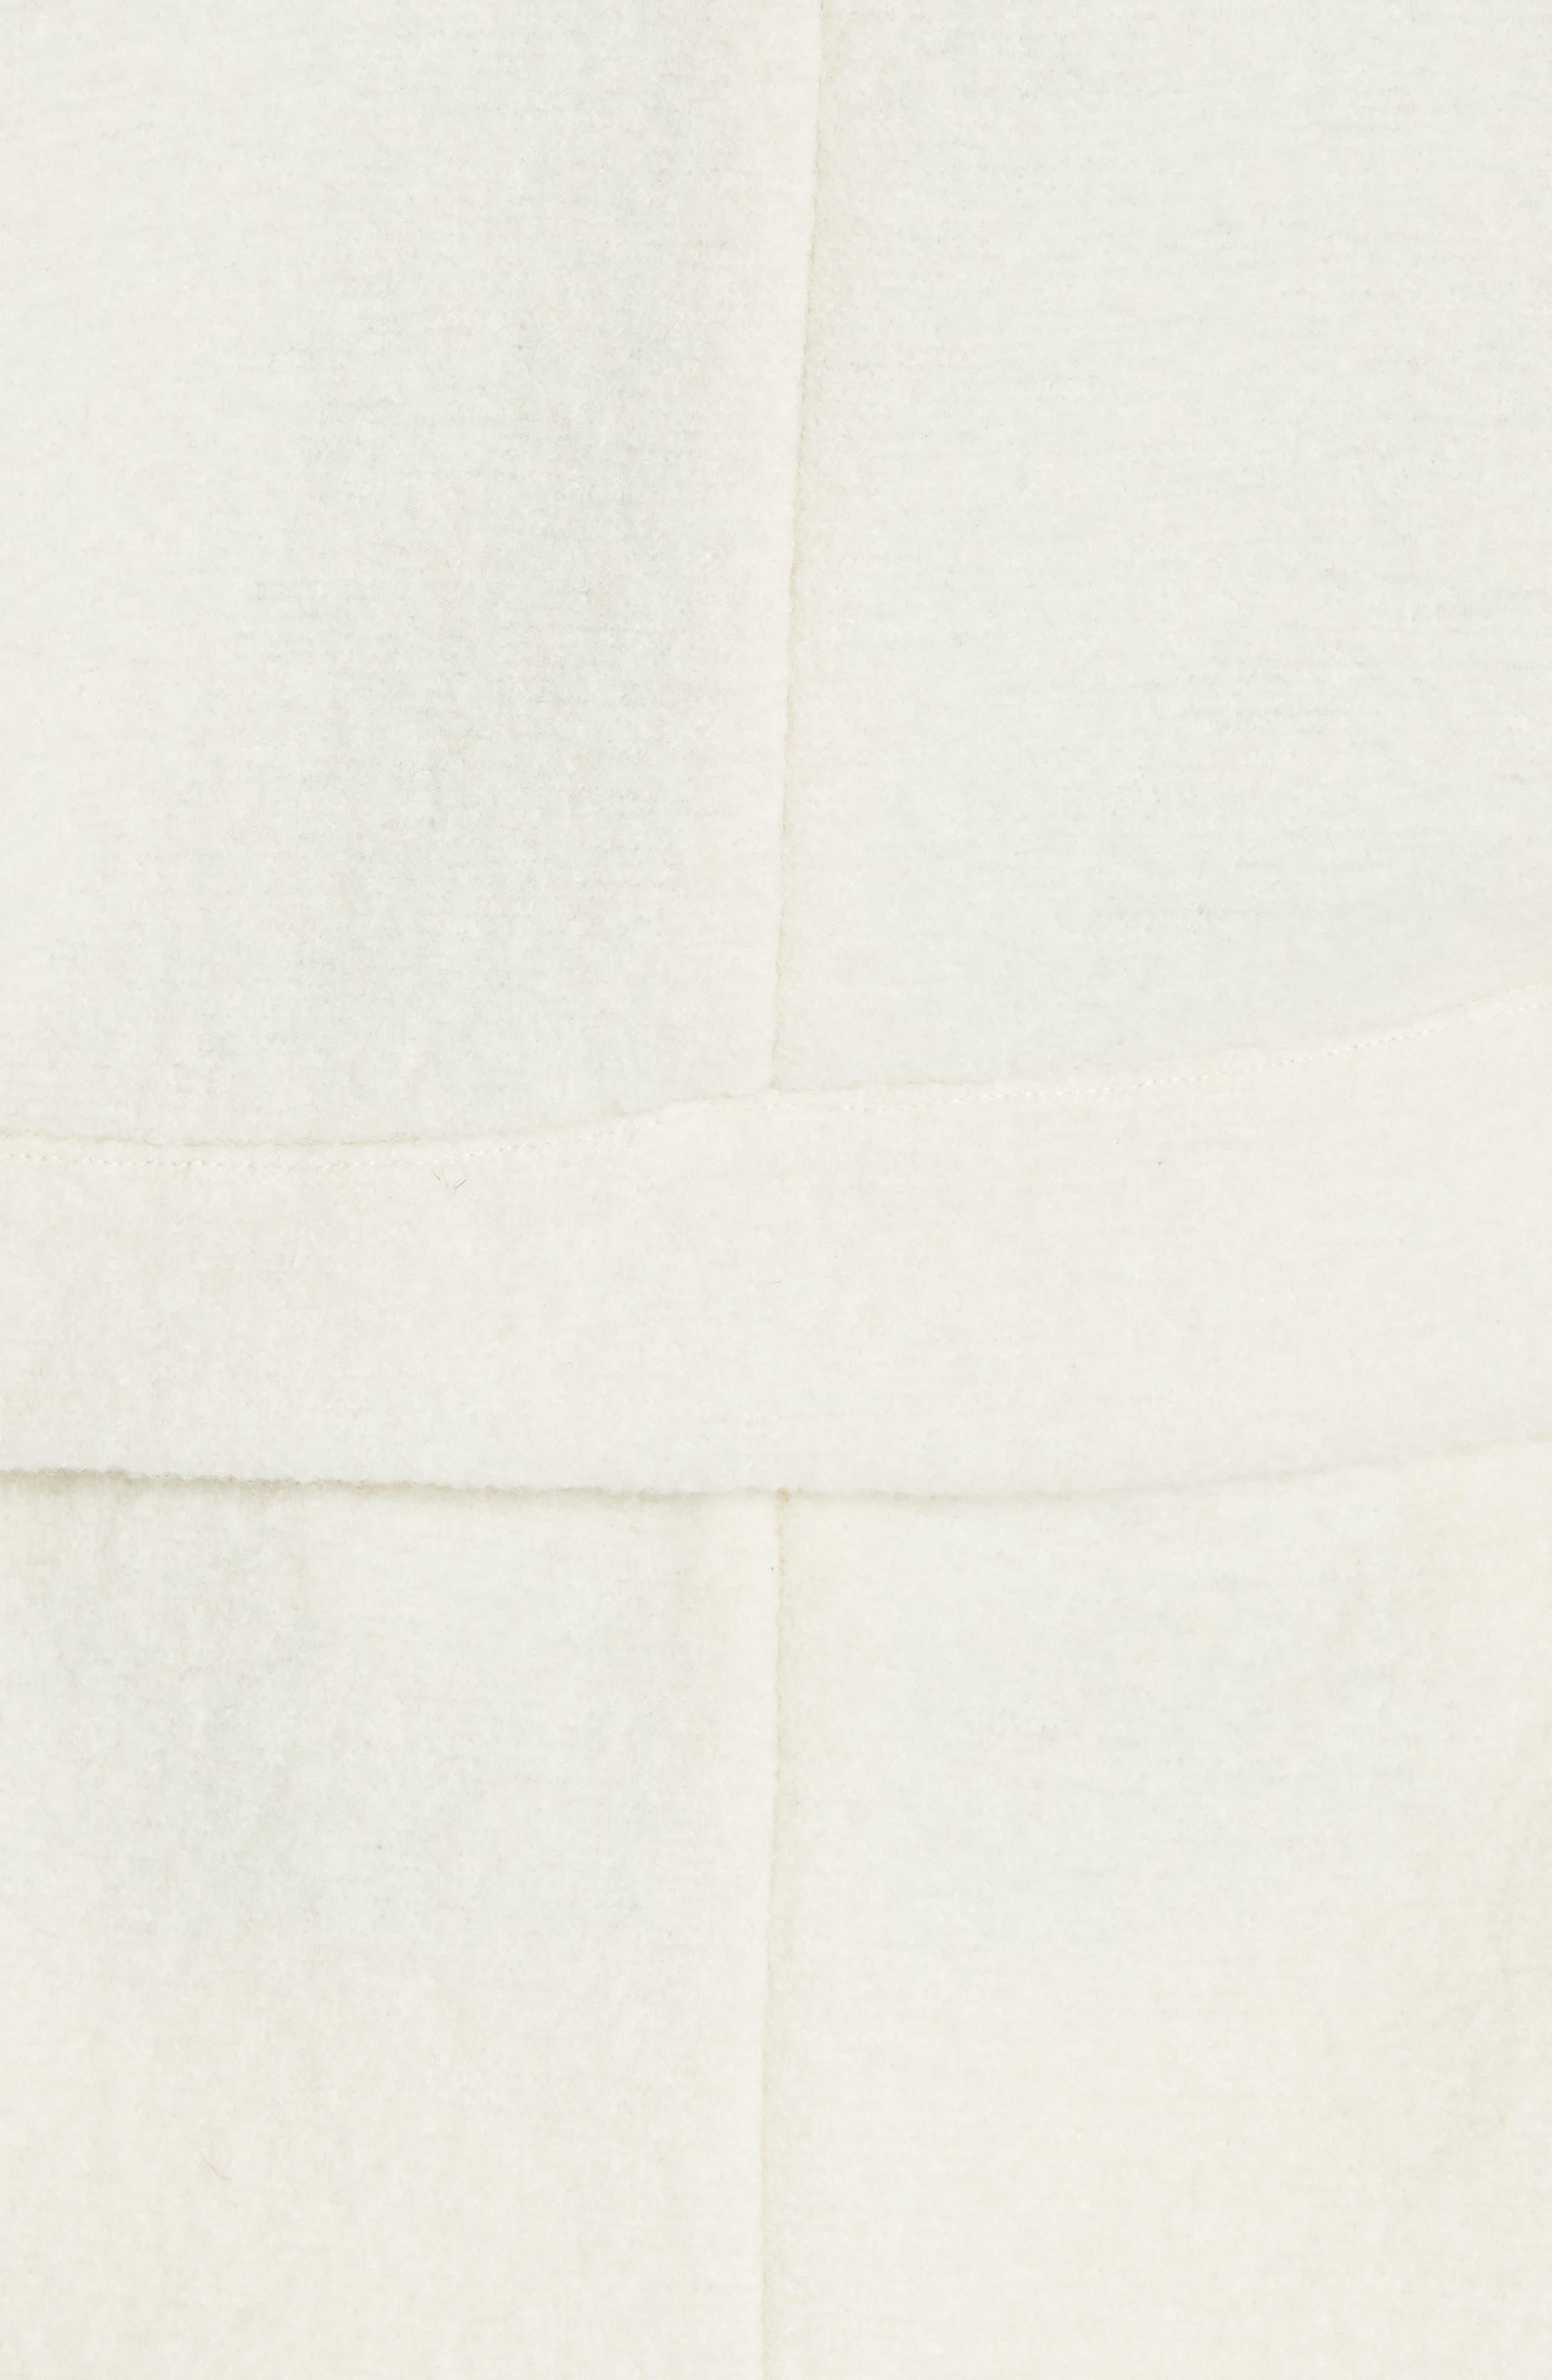 Clif Belted Wool Coat,                             Alternate thumbnail 6, color,                             ECRU